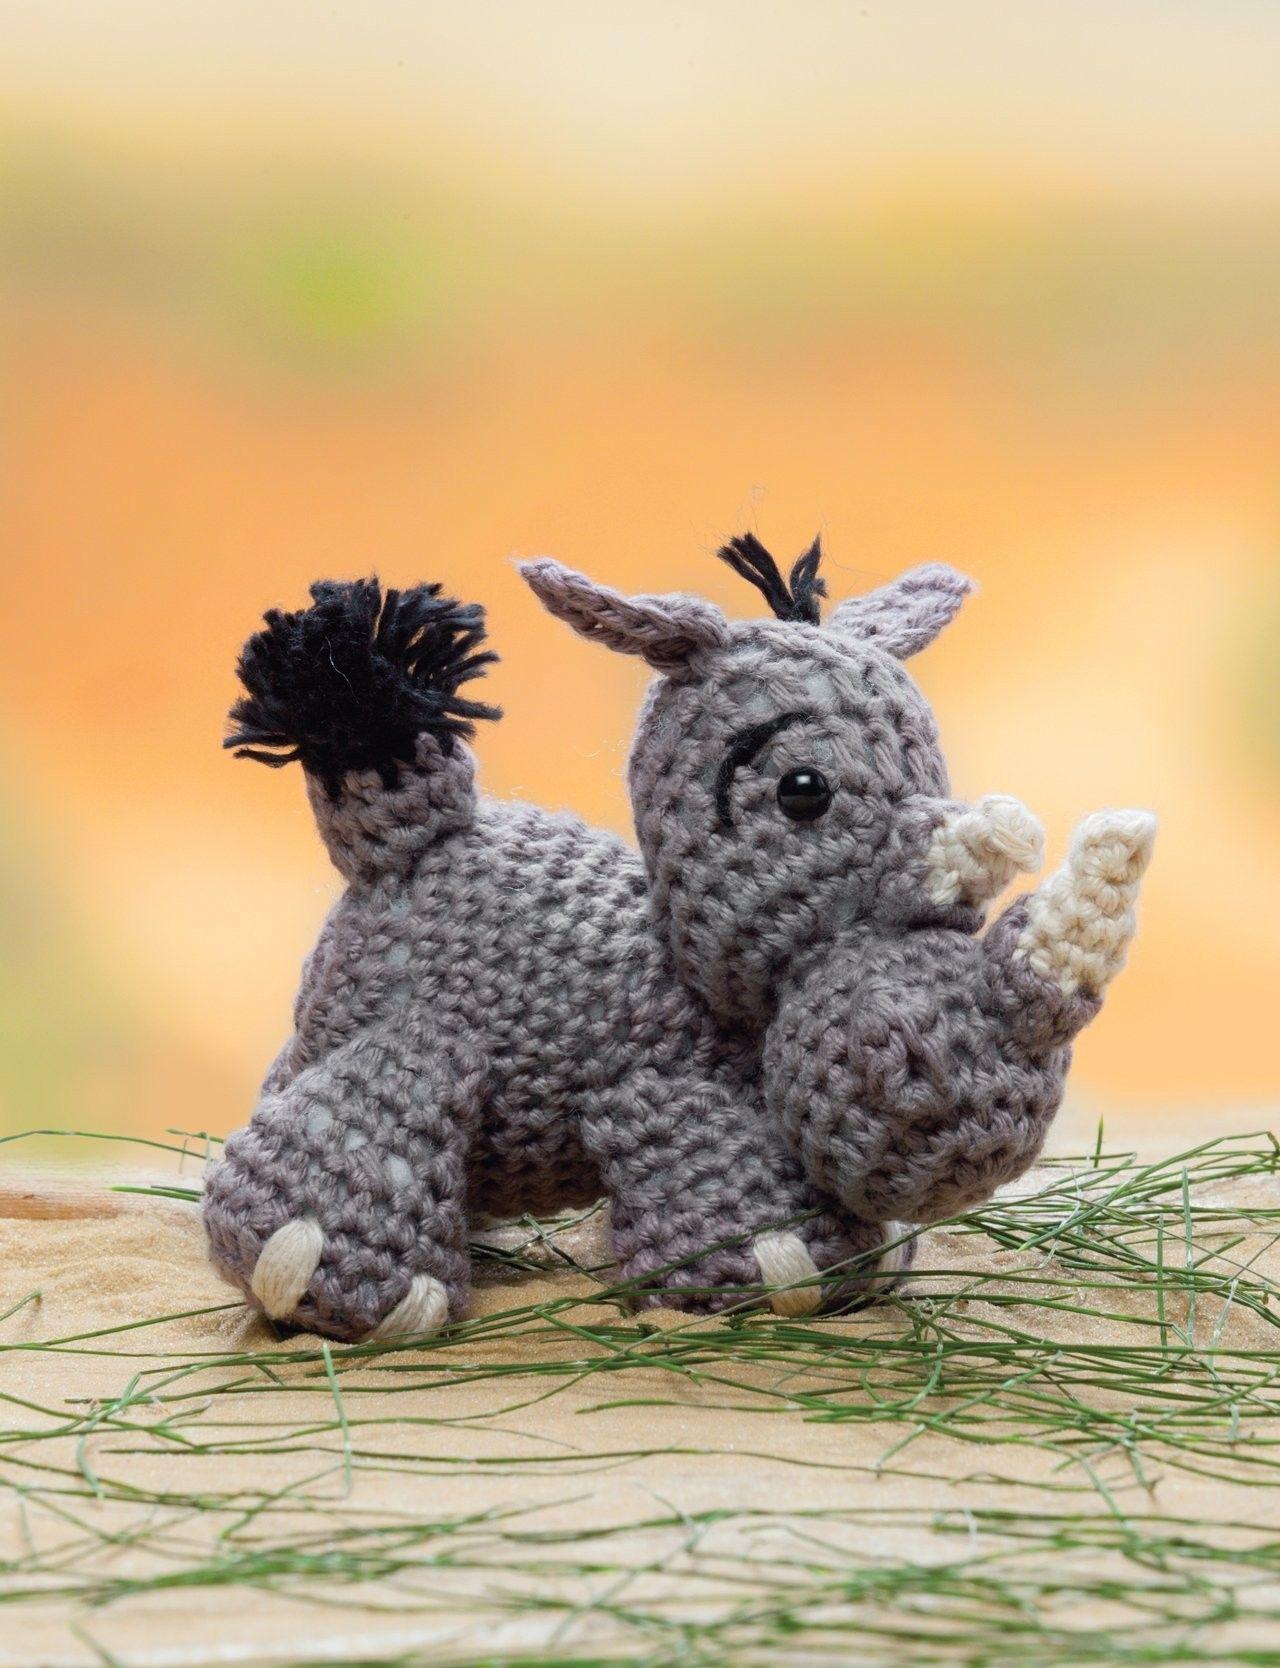 Crochet Patterns Zoo Animals : Crochet a Zoo Crochet Pinterest